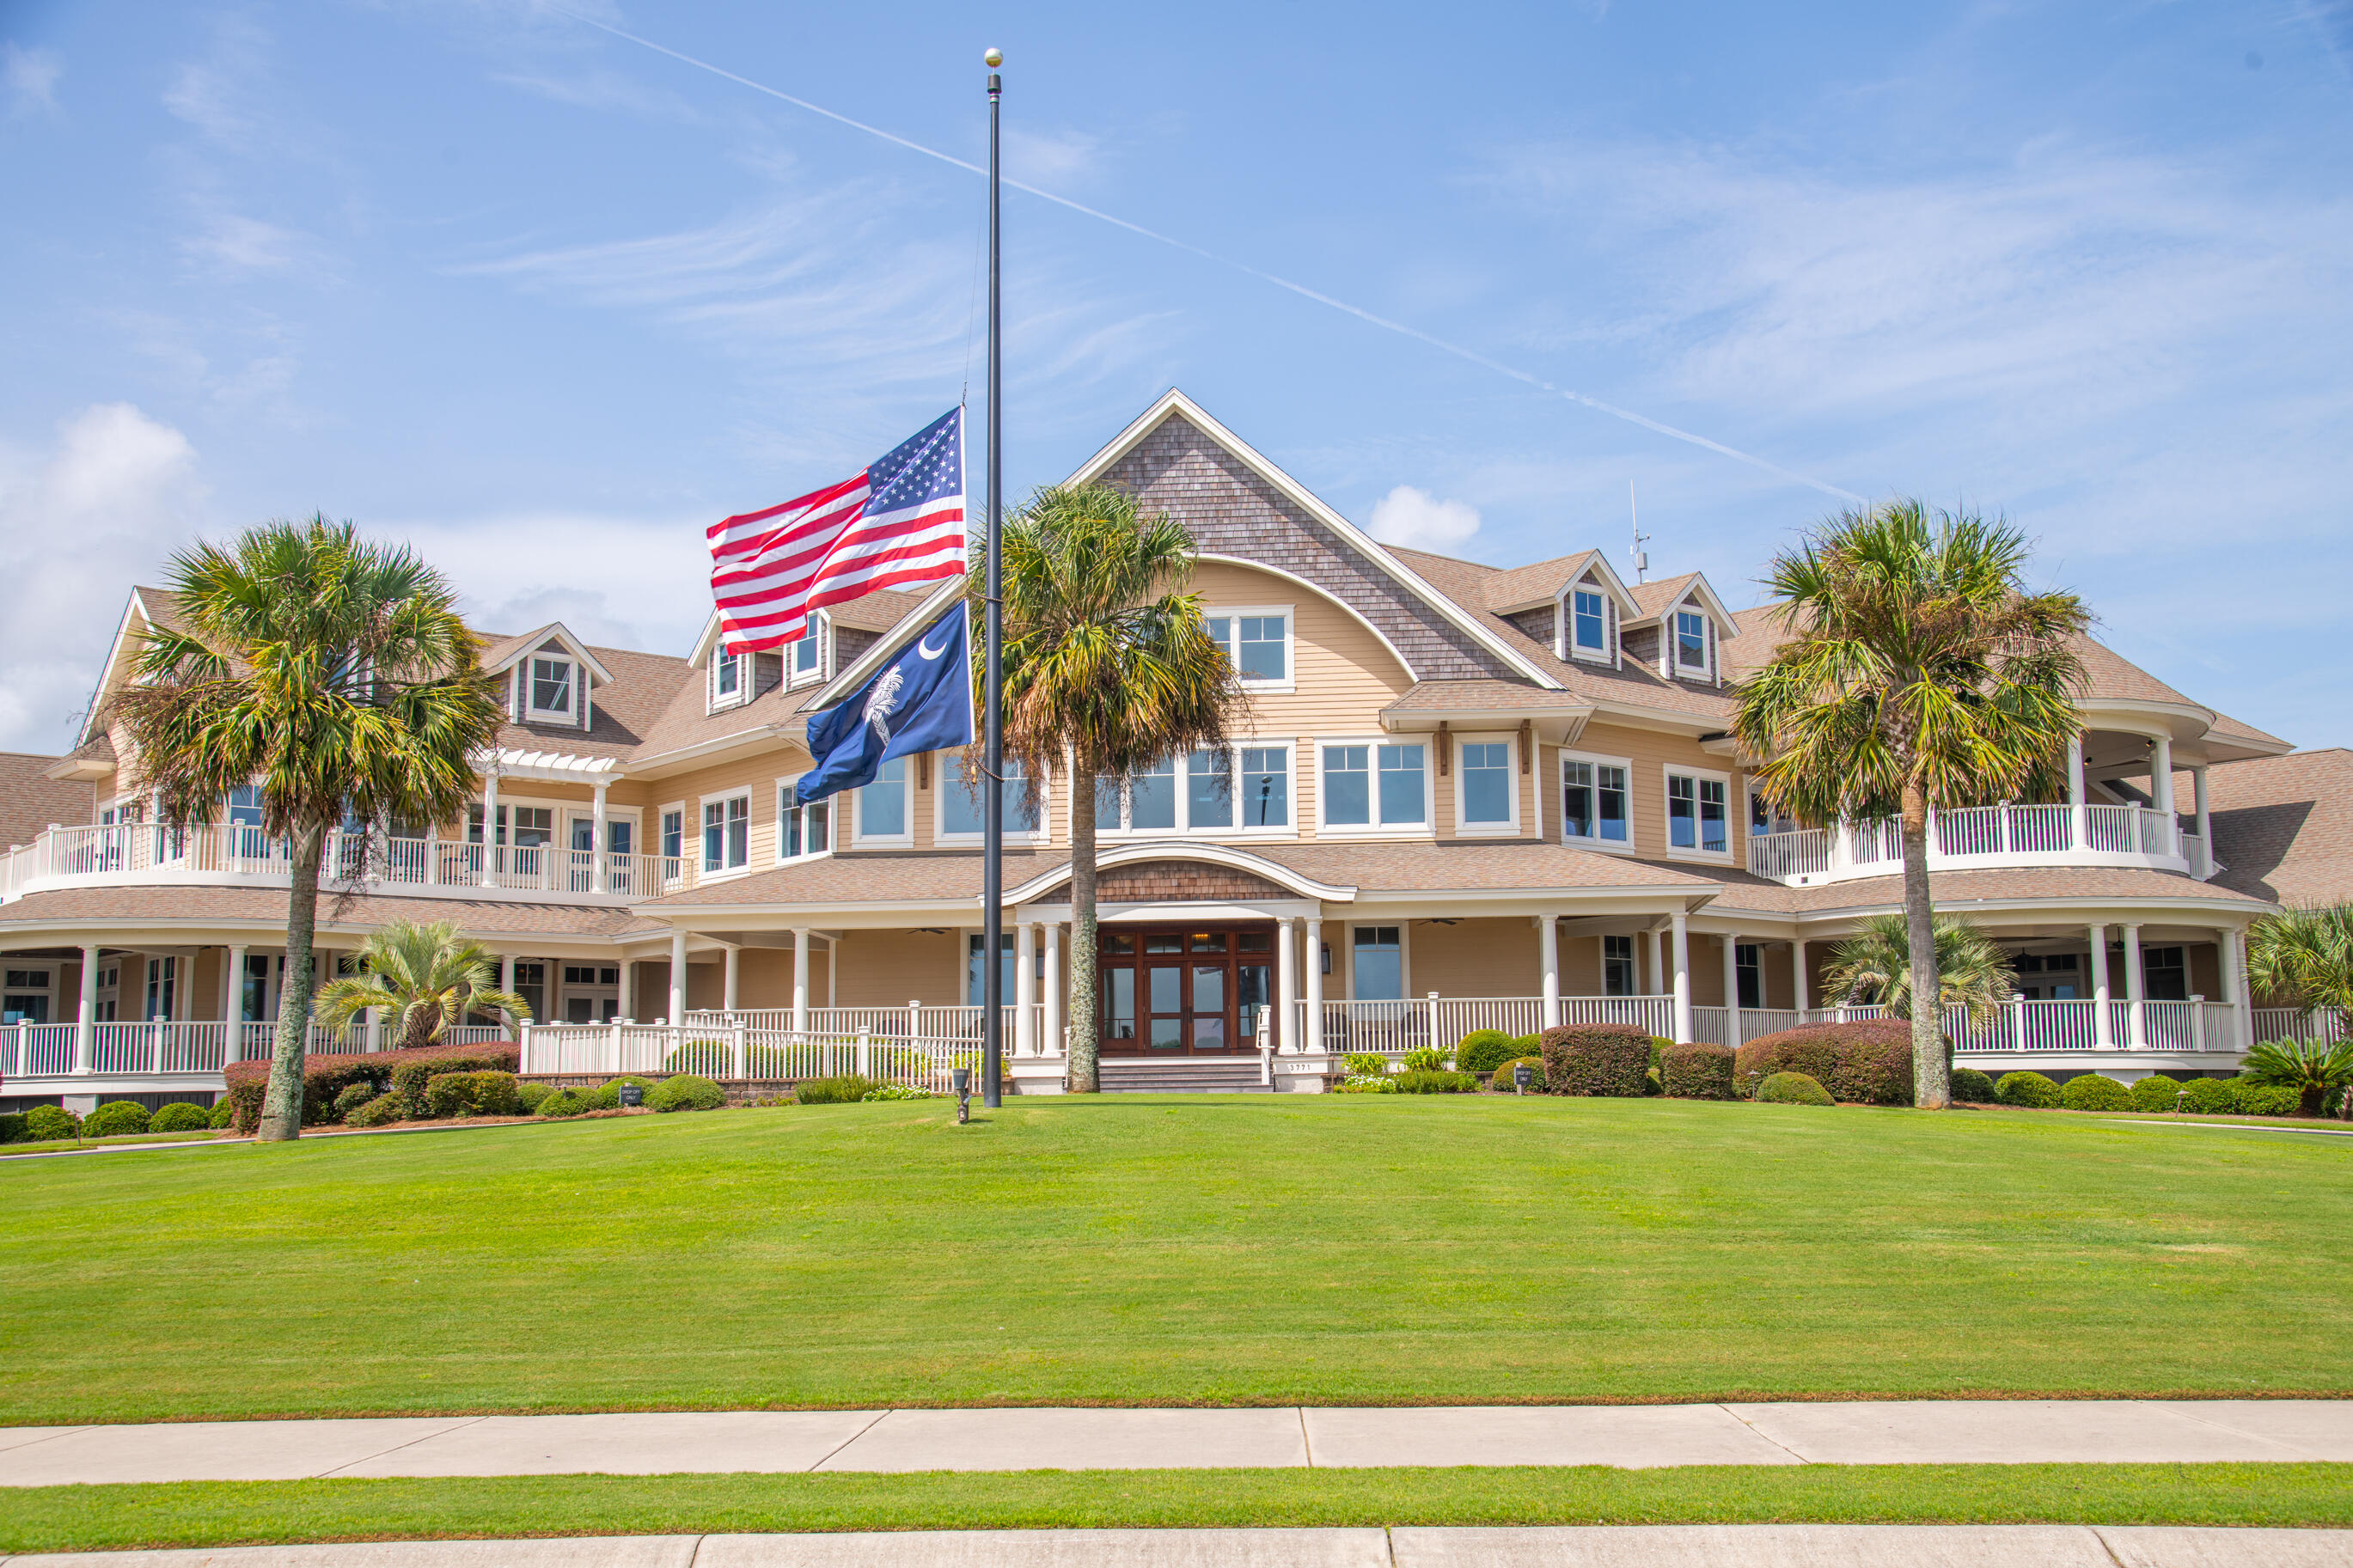 Atrium Villas Homes For Sale - 2935 Atrium Villa, Seabrook Island, SC - 9